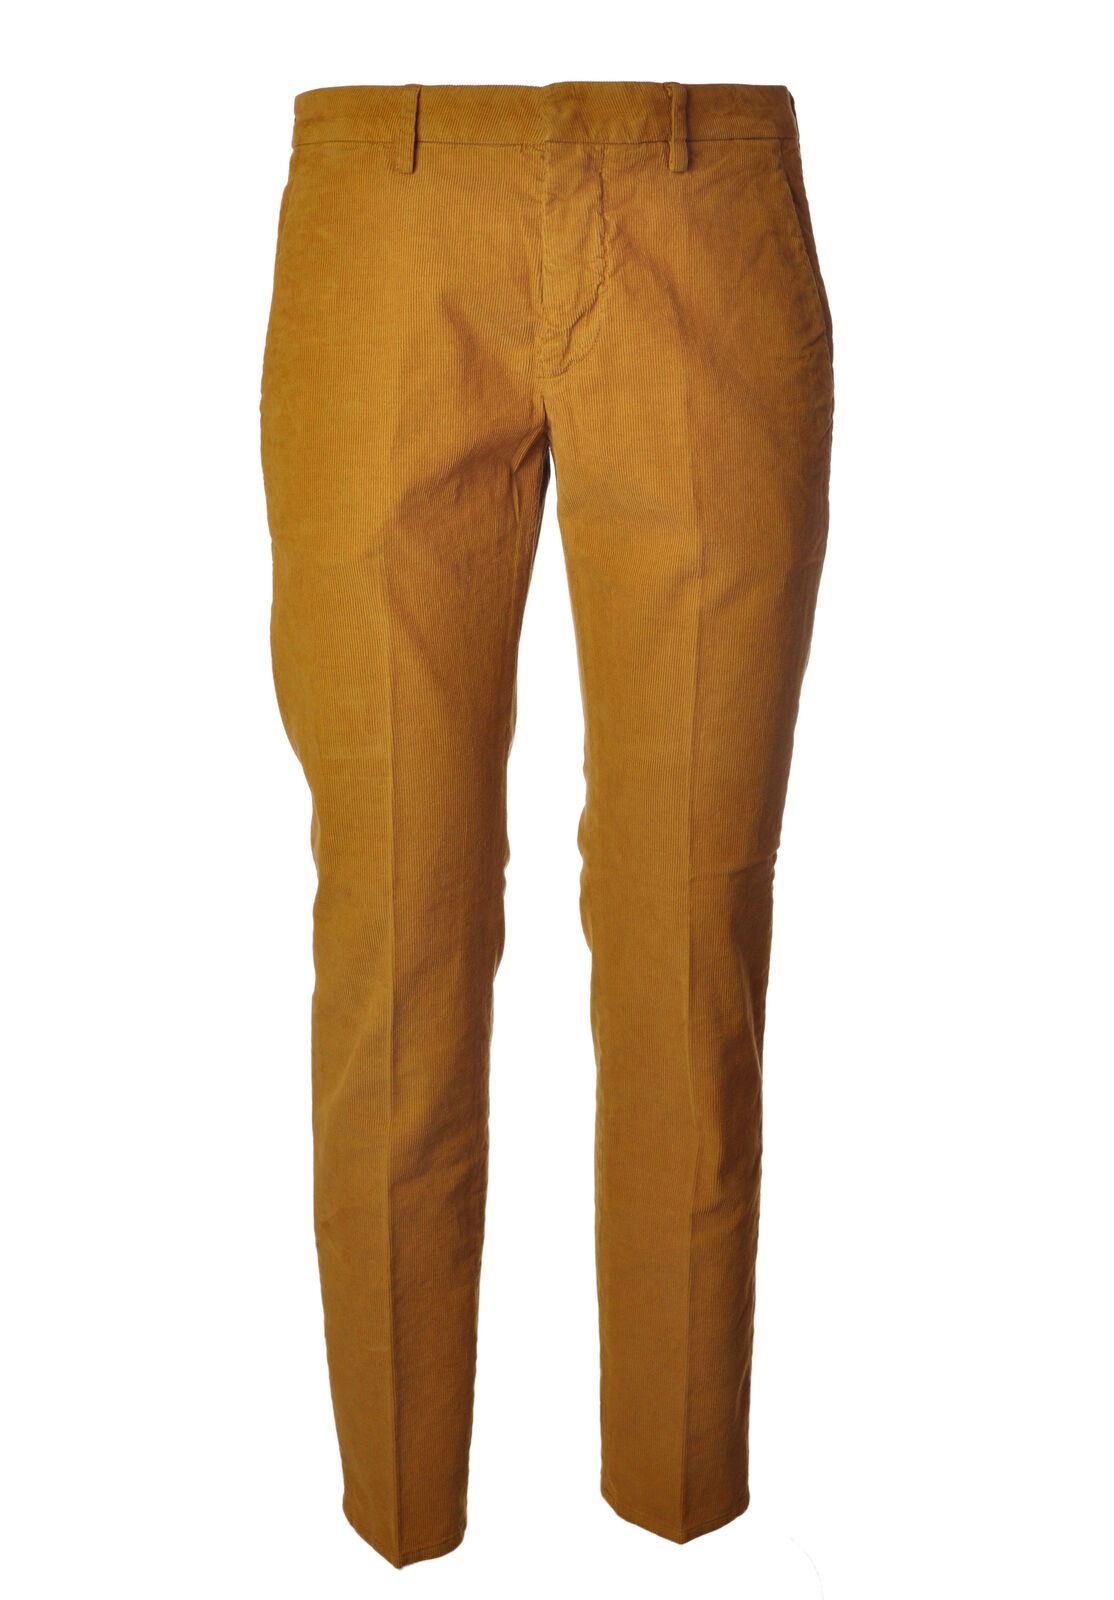 Dondup - Pants-Pants - Man - Beige - 4014104M184058